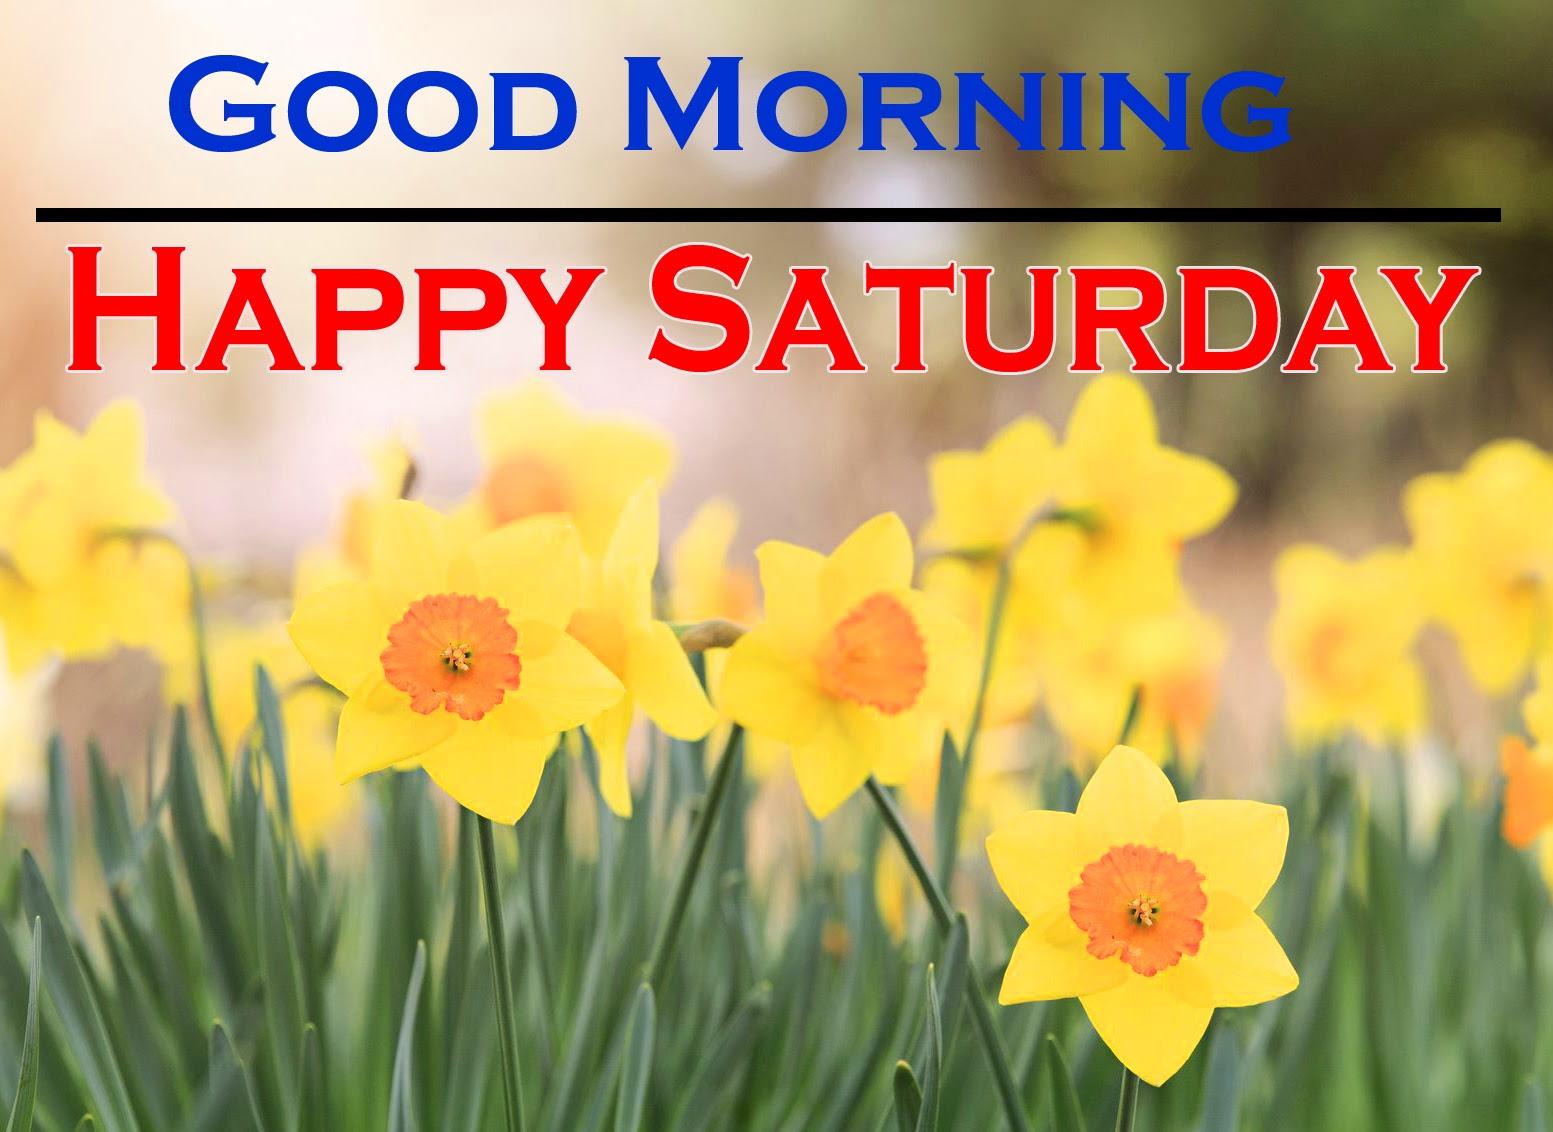 Saturday Good Morning Images 8